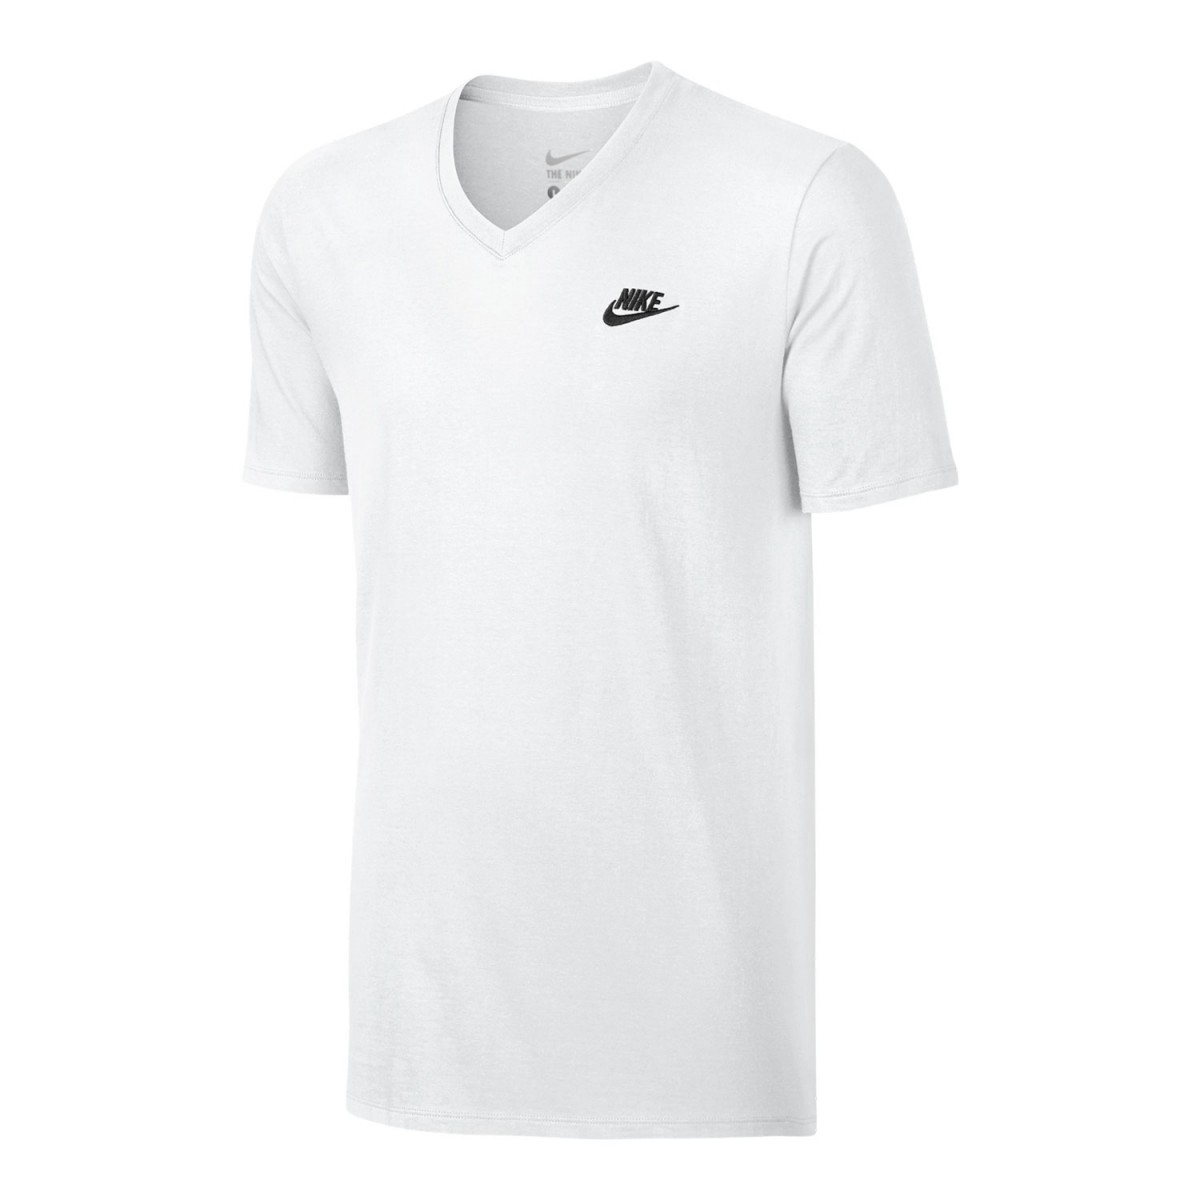 Camiseta Masculina Nike TTE - V Neck 827023 - 063 Branco